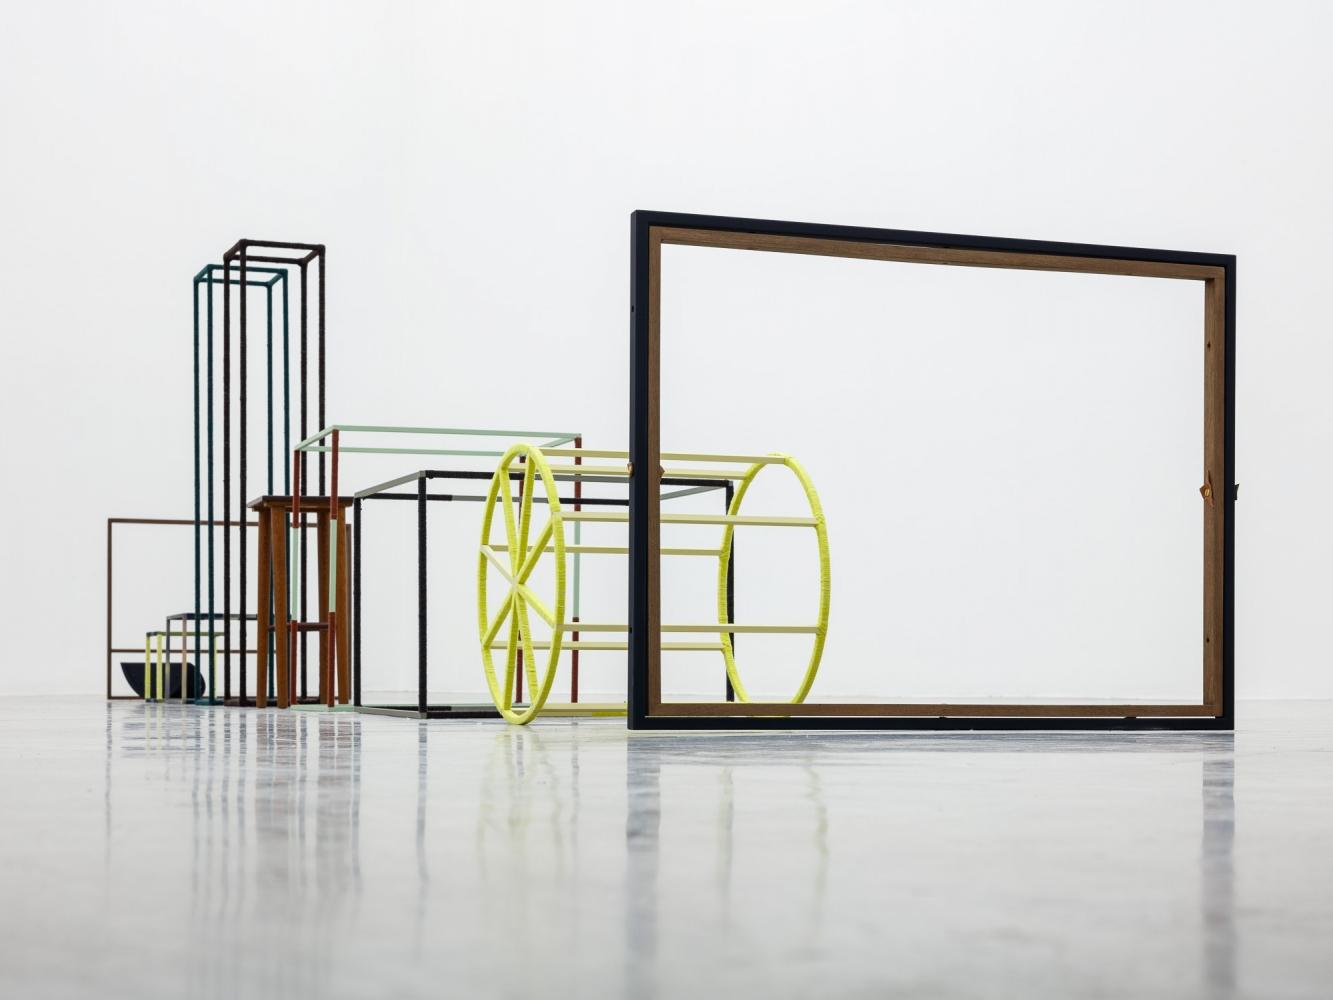 Suki Seokyeong Kang (b.1977)  Pause and Position - Jeong, 2012-2018  Painted steel, thread, wood, table  Dimensions variable